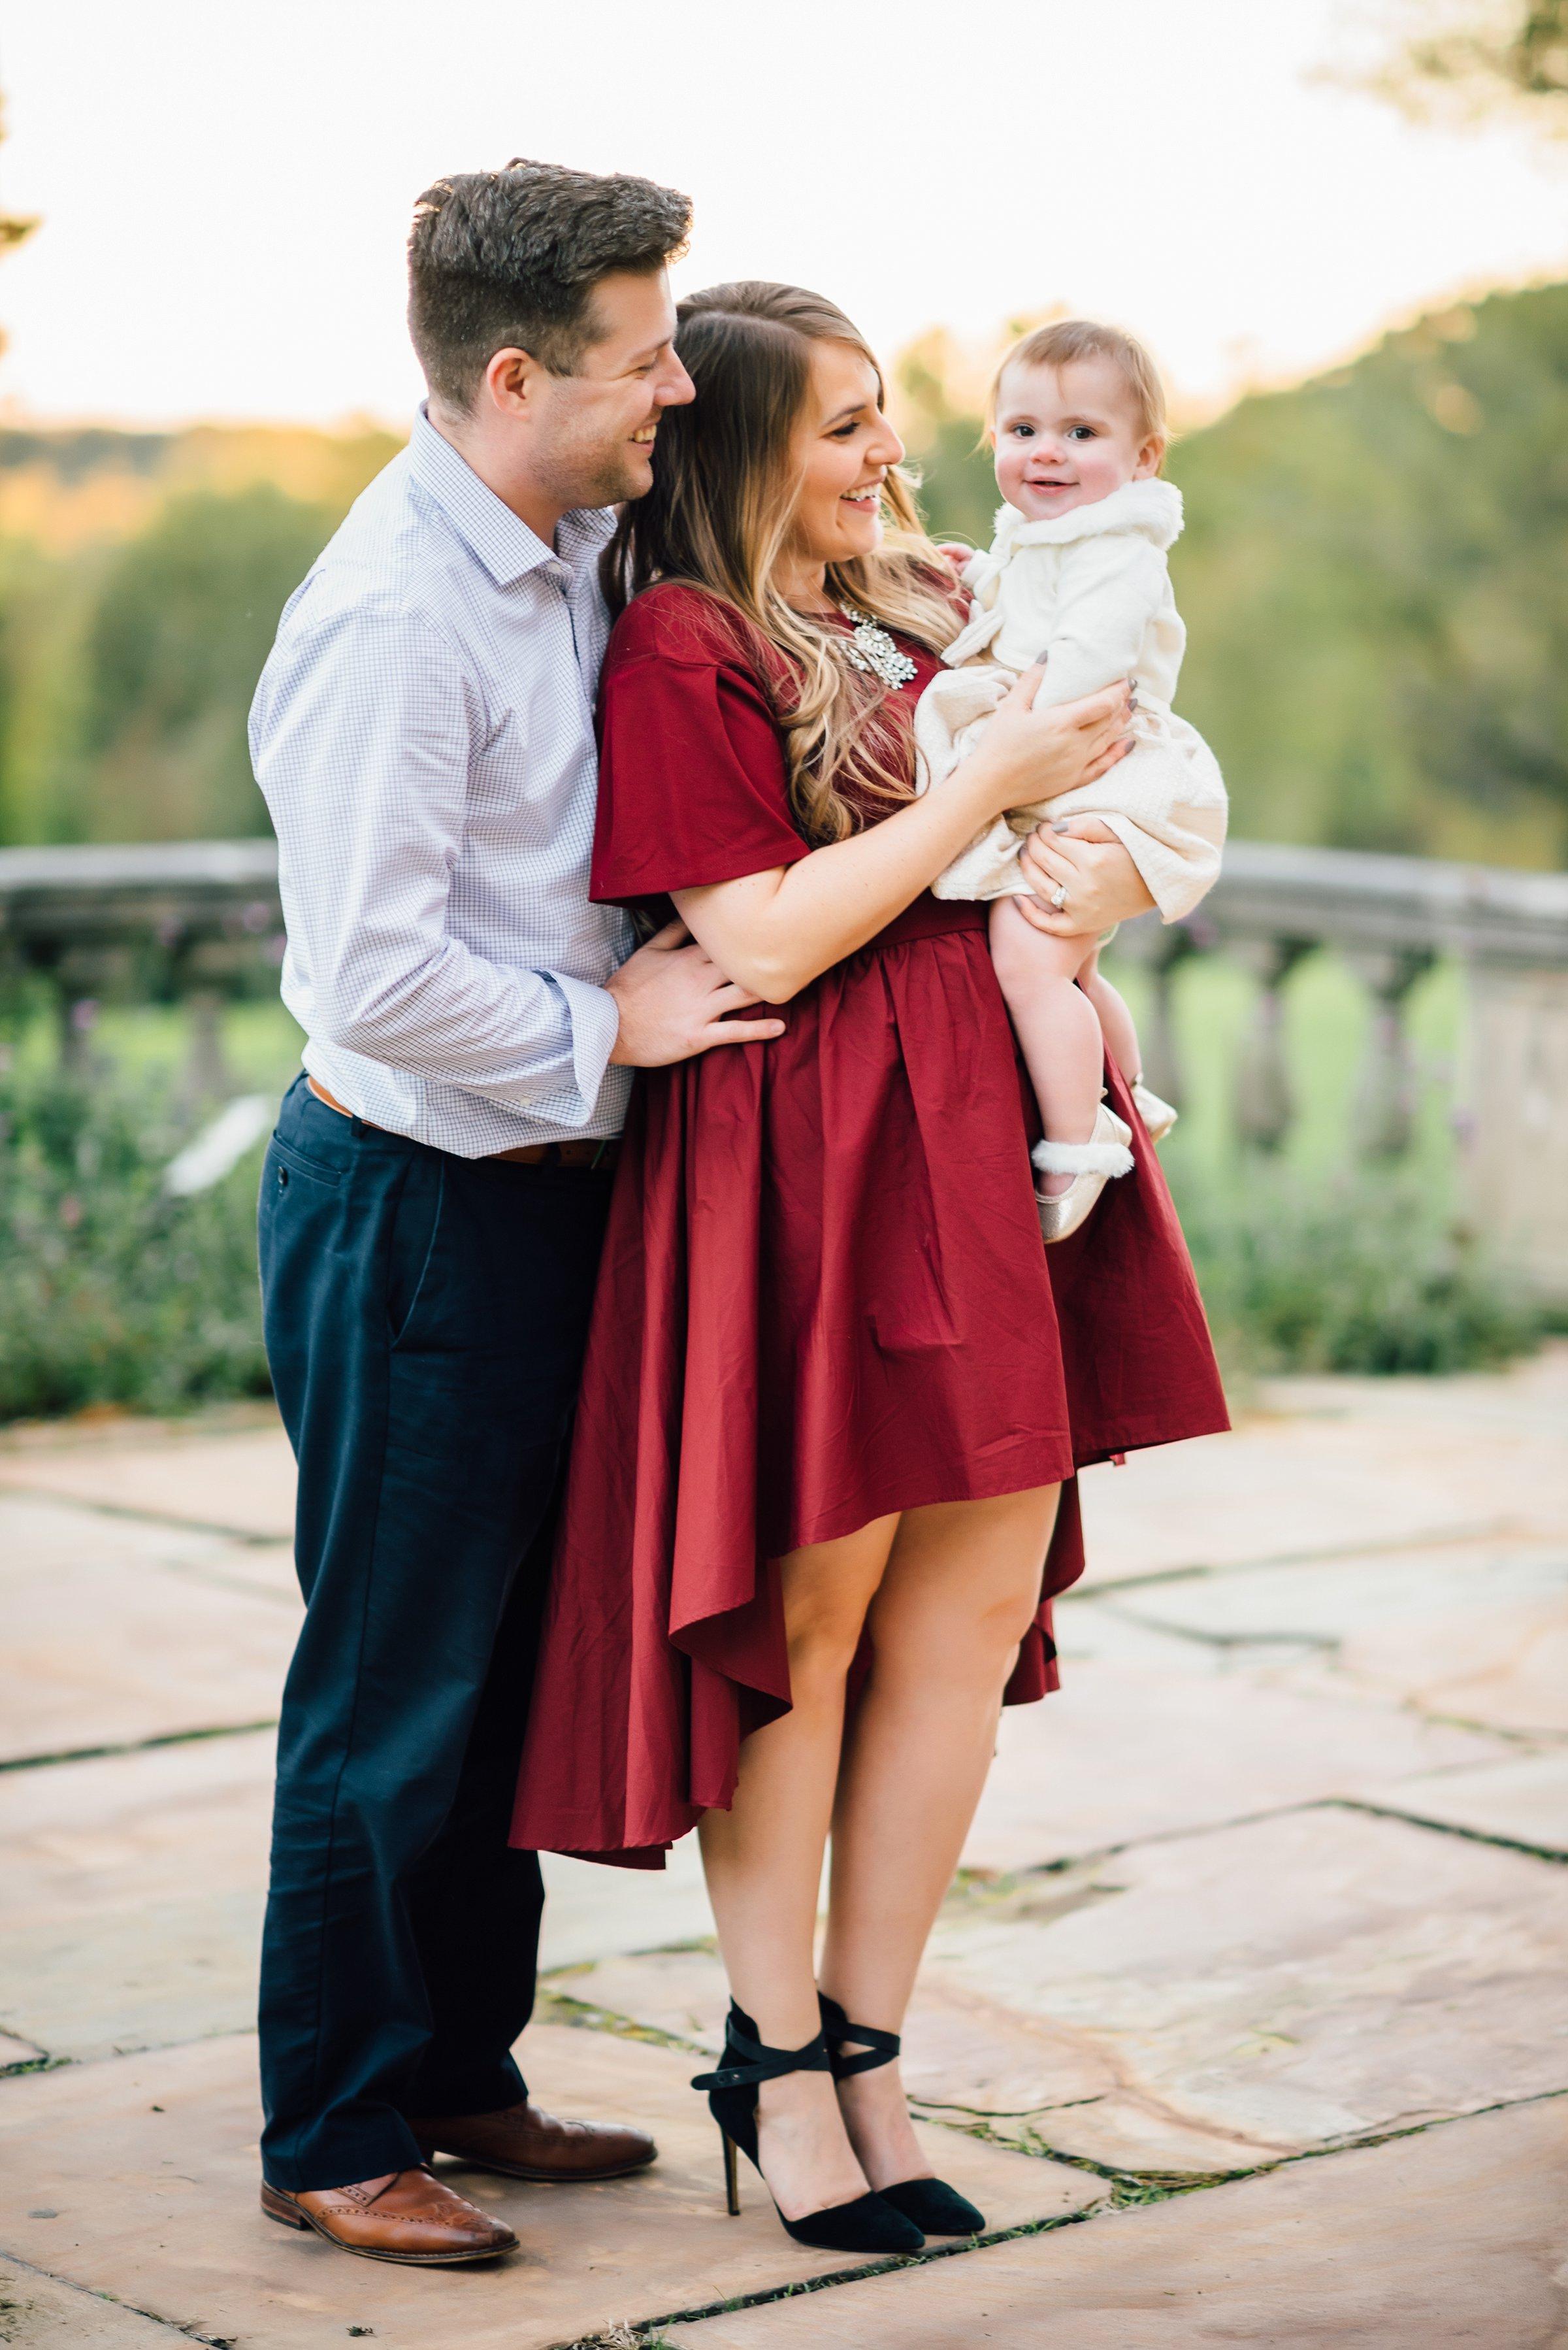 Family Photography Hartwood Acres Mansion Pittsburgh Rachel Rossetti_0344.jpg